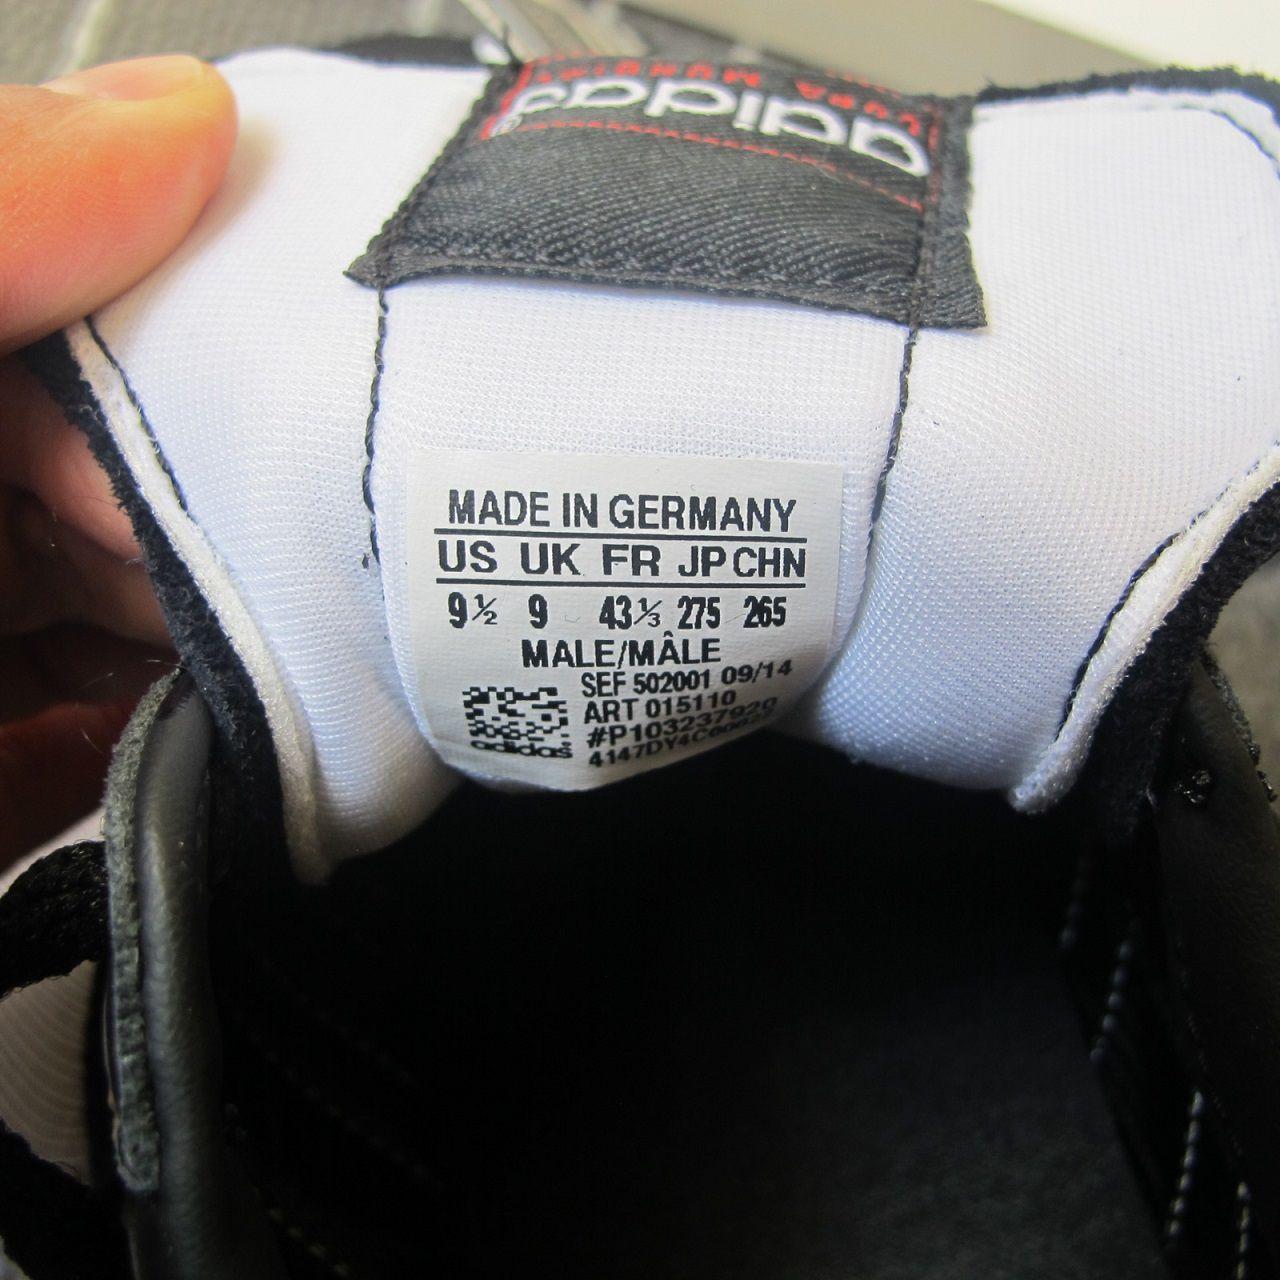 Chuteira Adidas Copa Mundial FG - Couro de Canguru